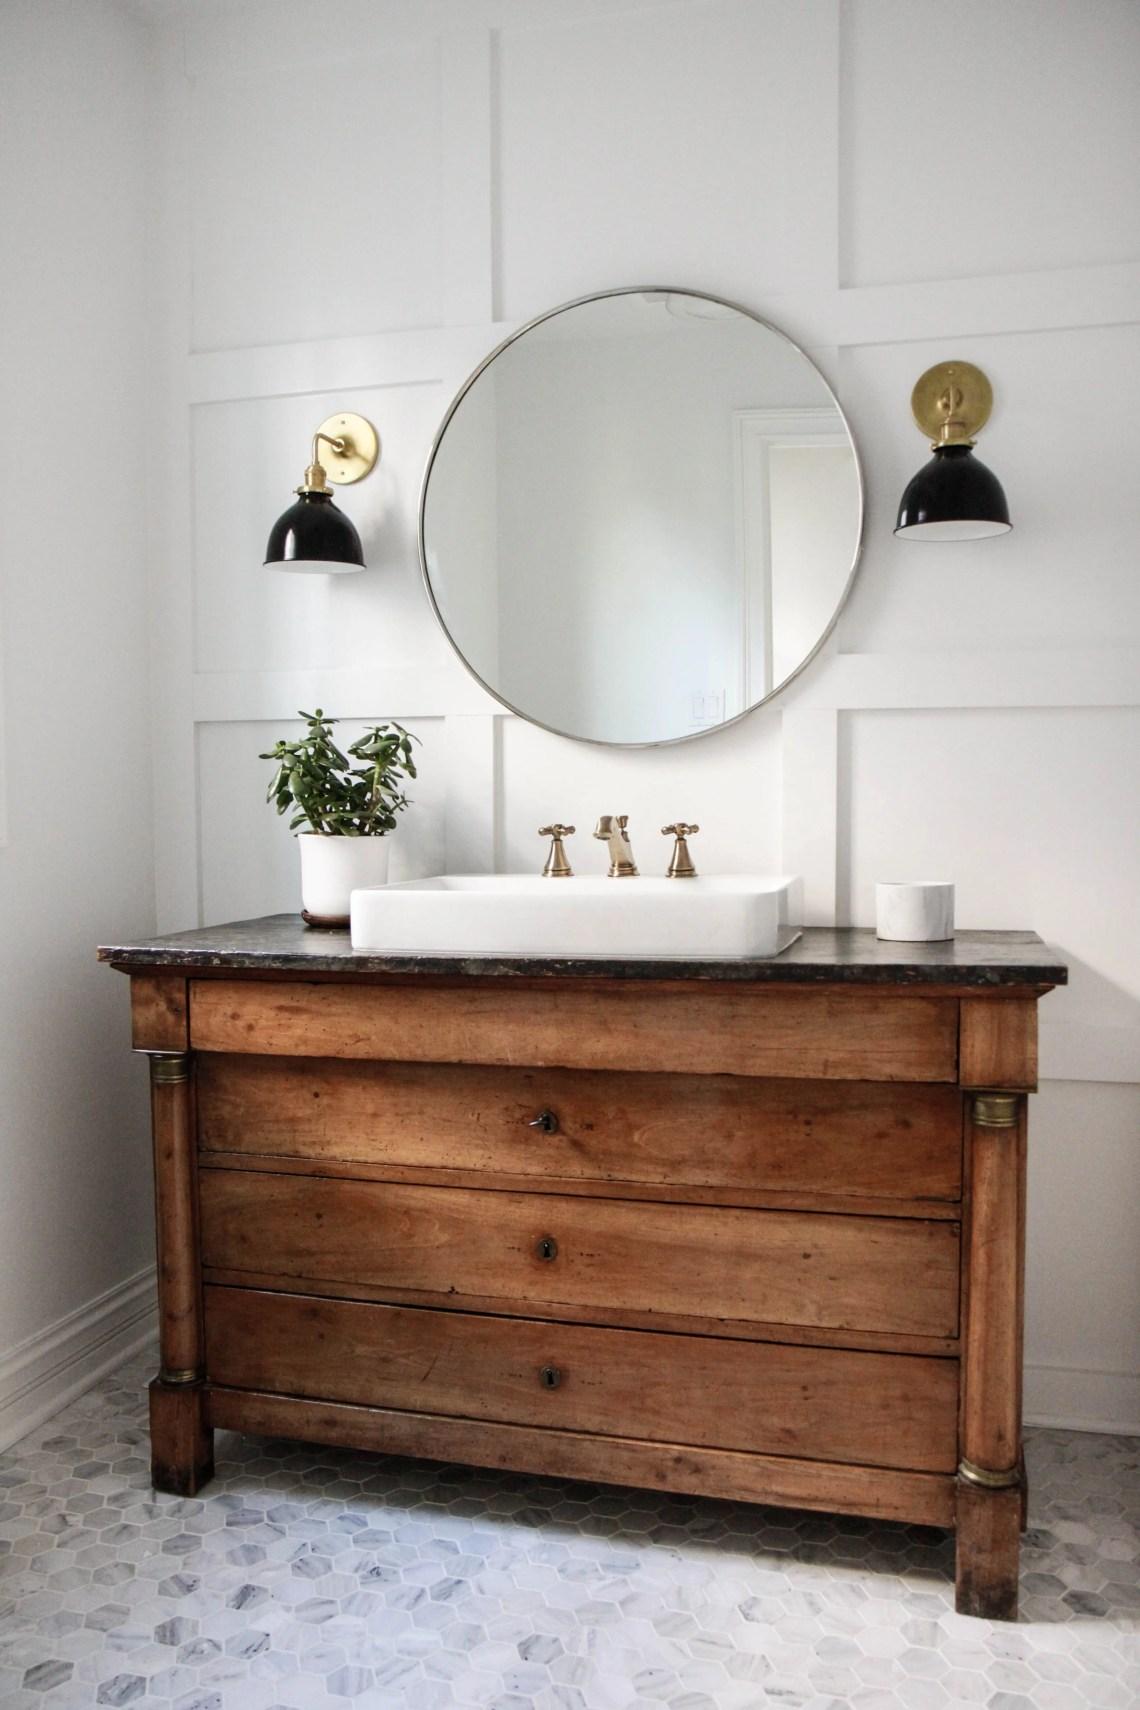 bathroom with an antique vanity - A Vintage Powder Room - Park And Oak Interior Design